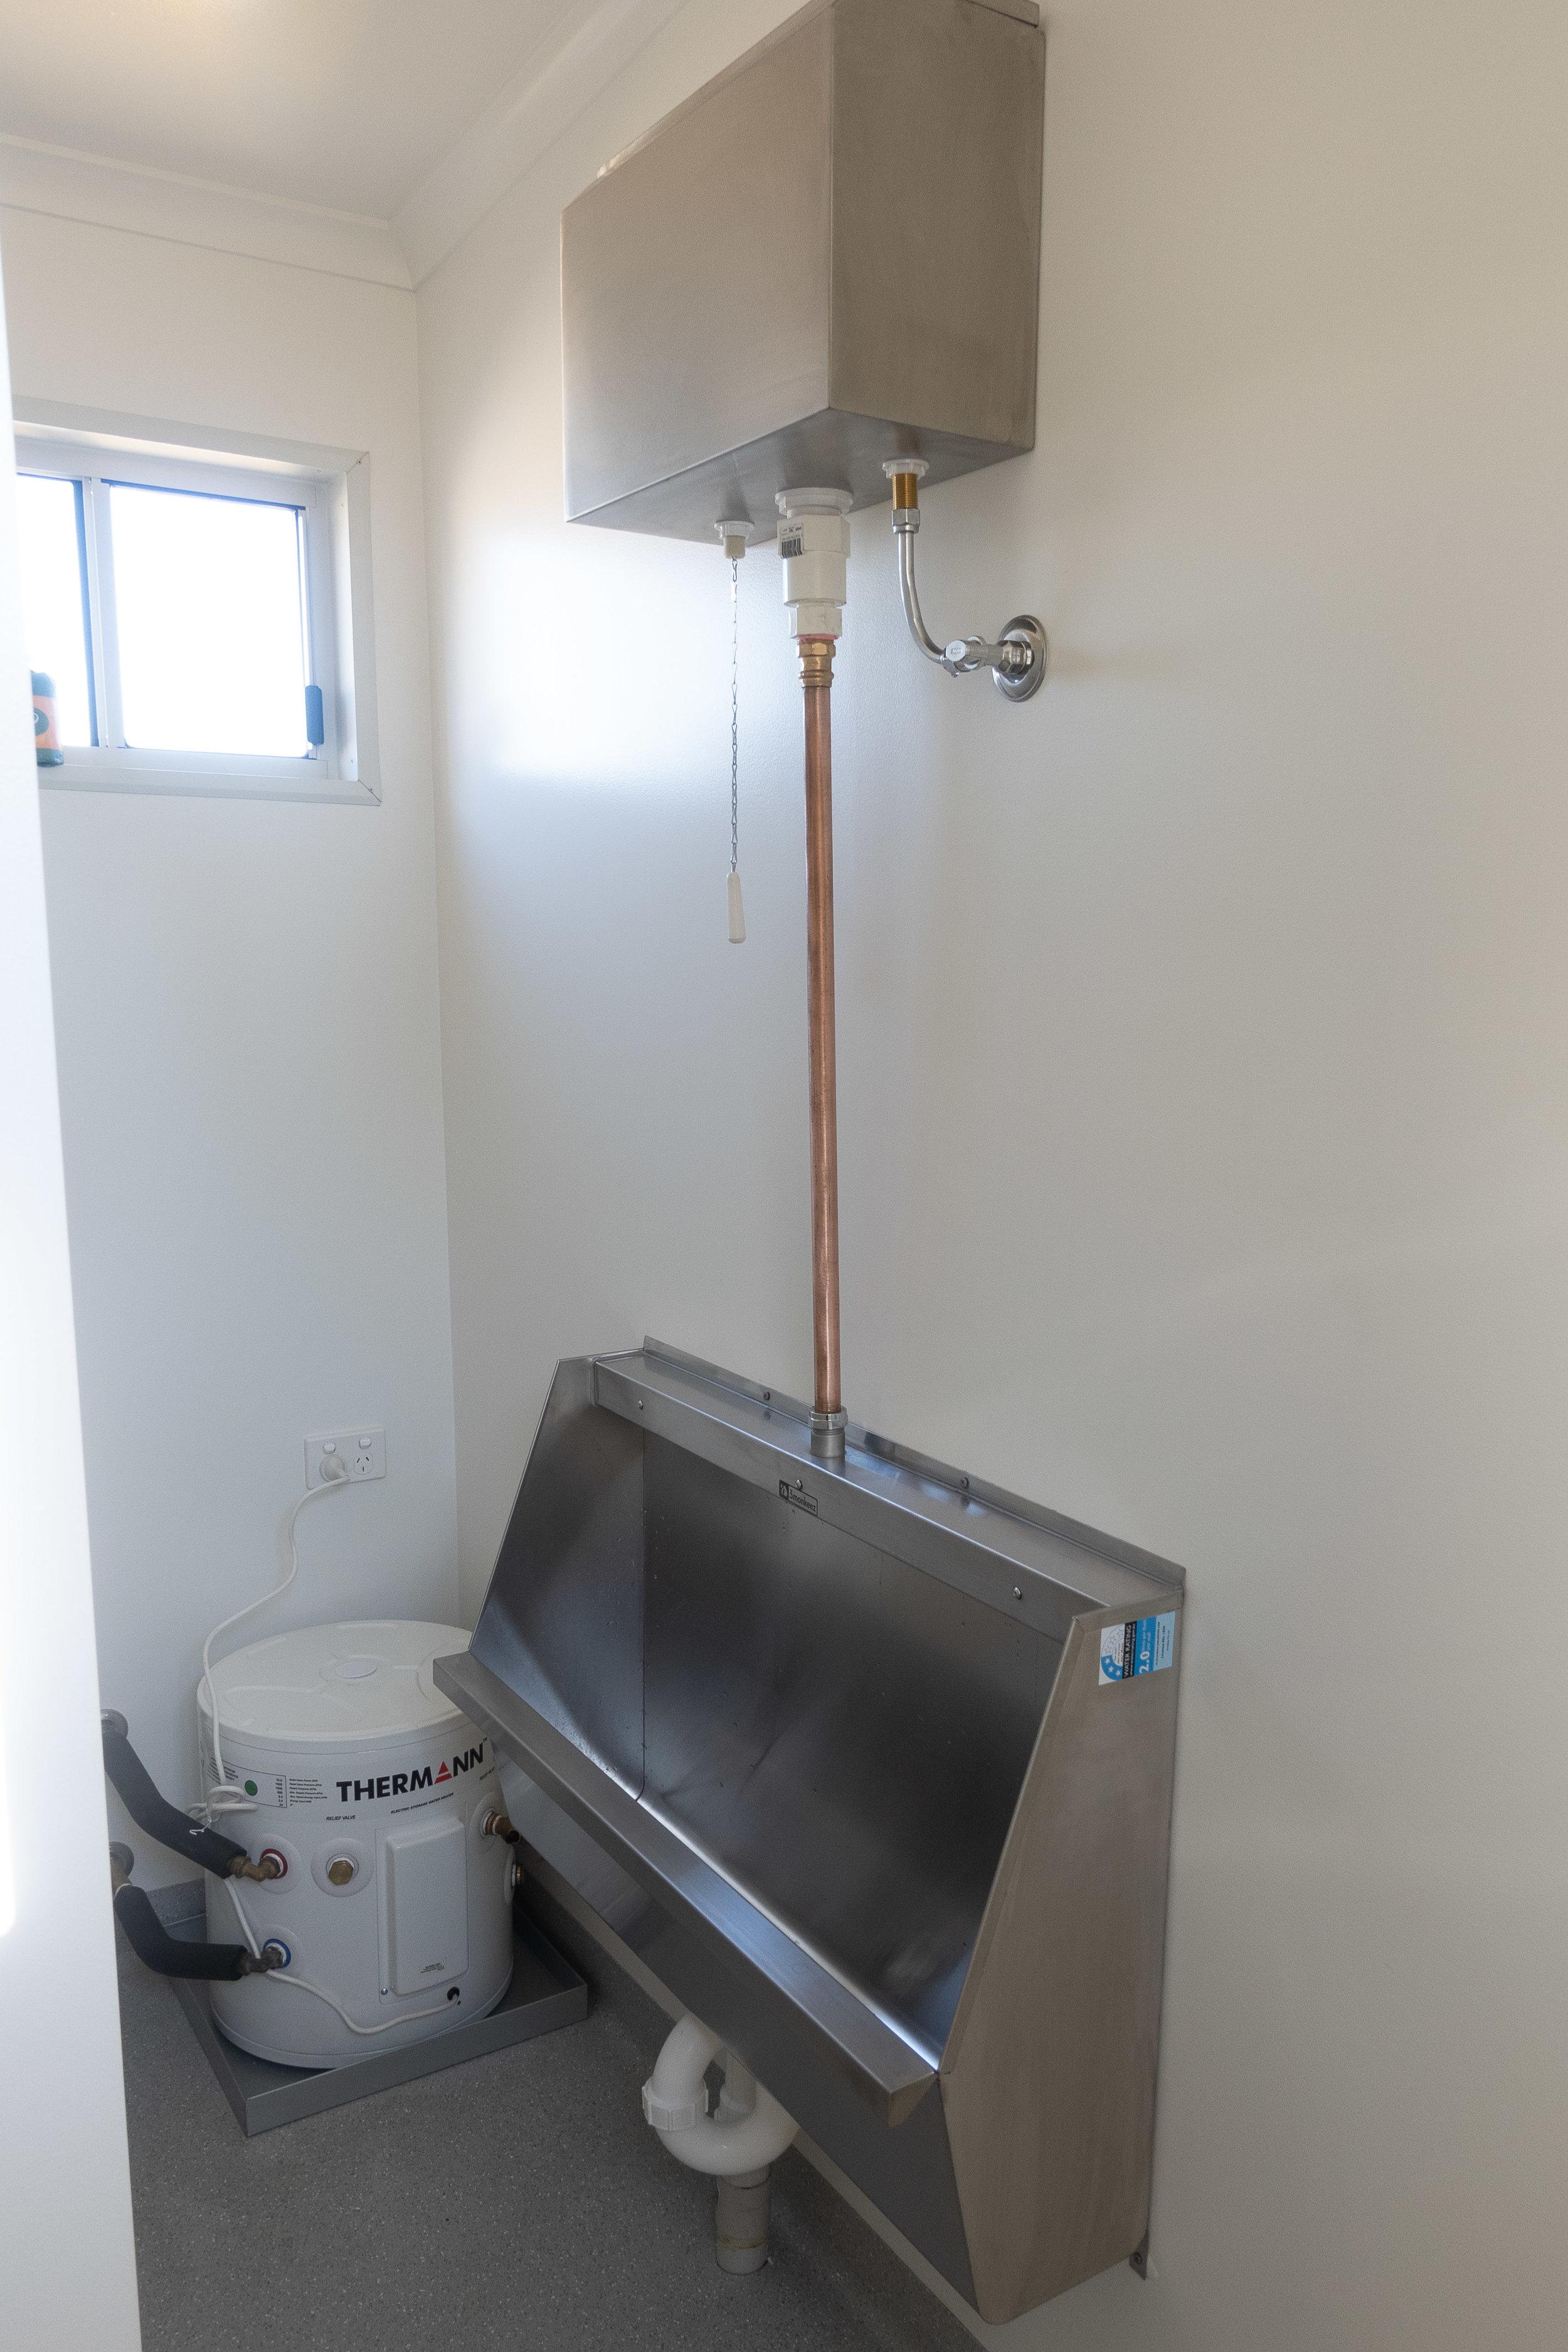 Toilets003.jpg